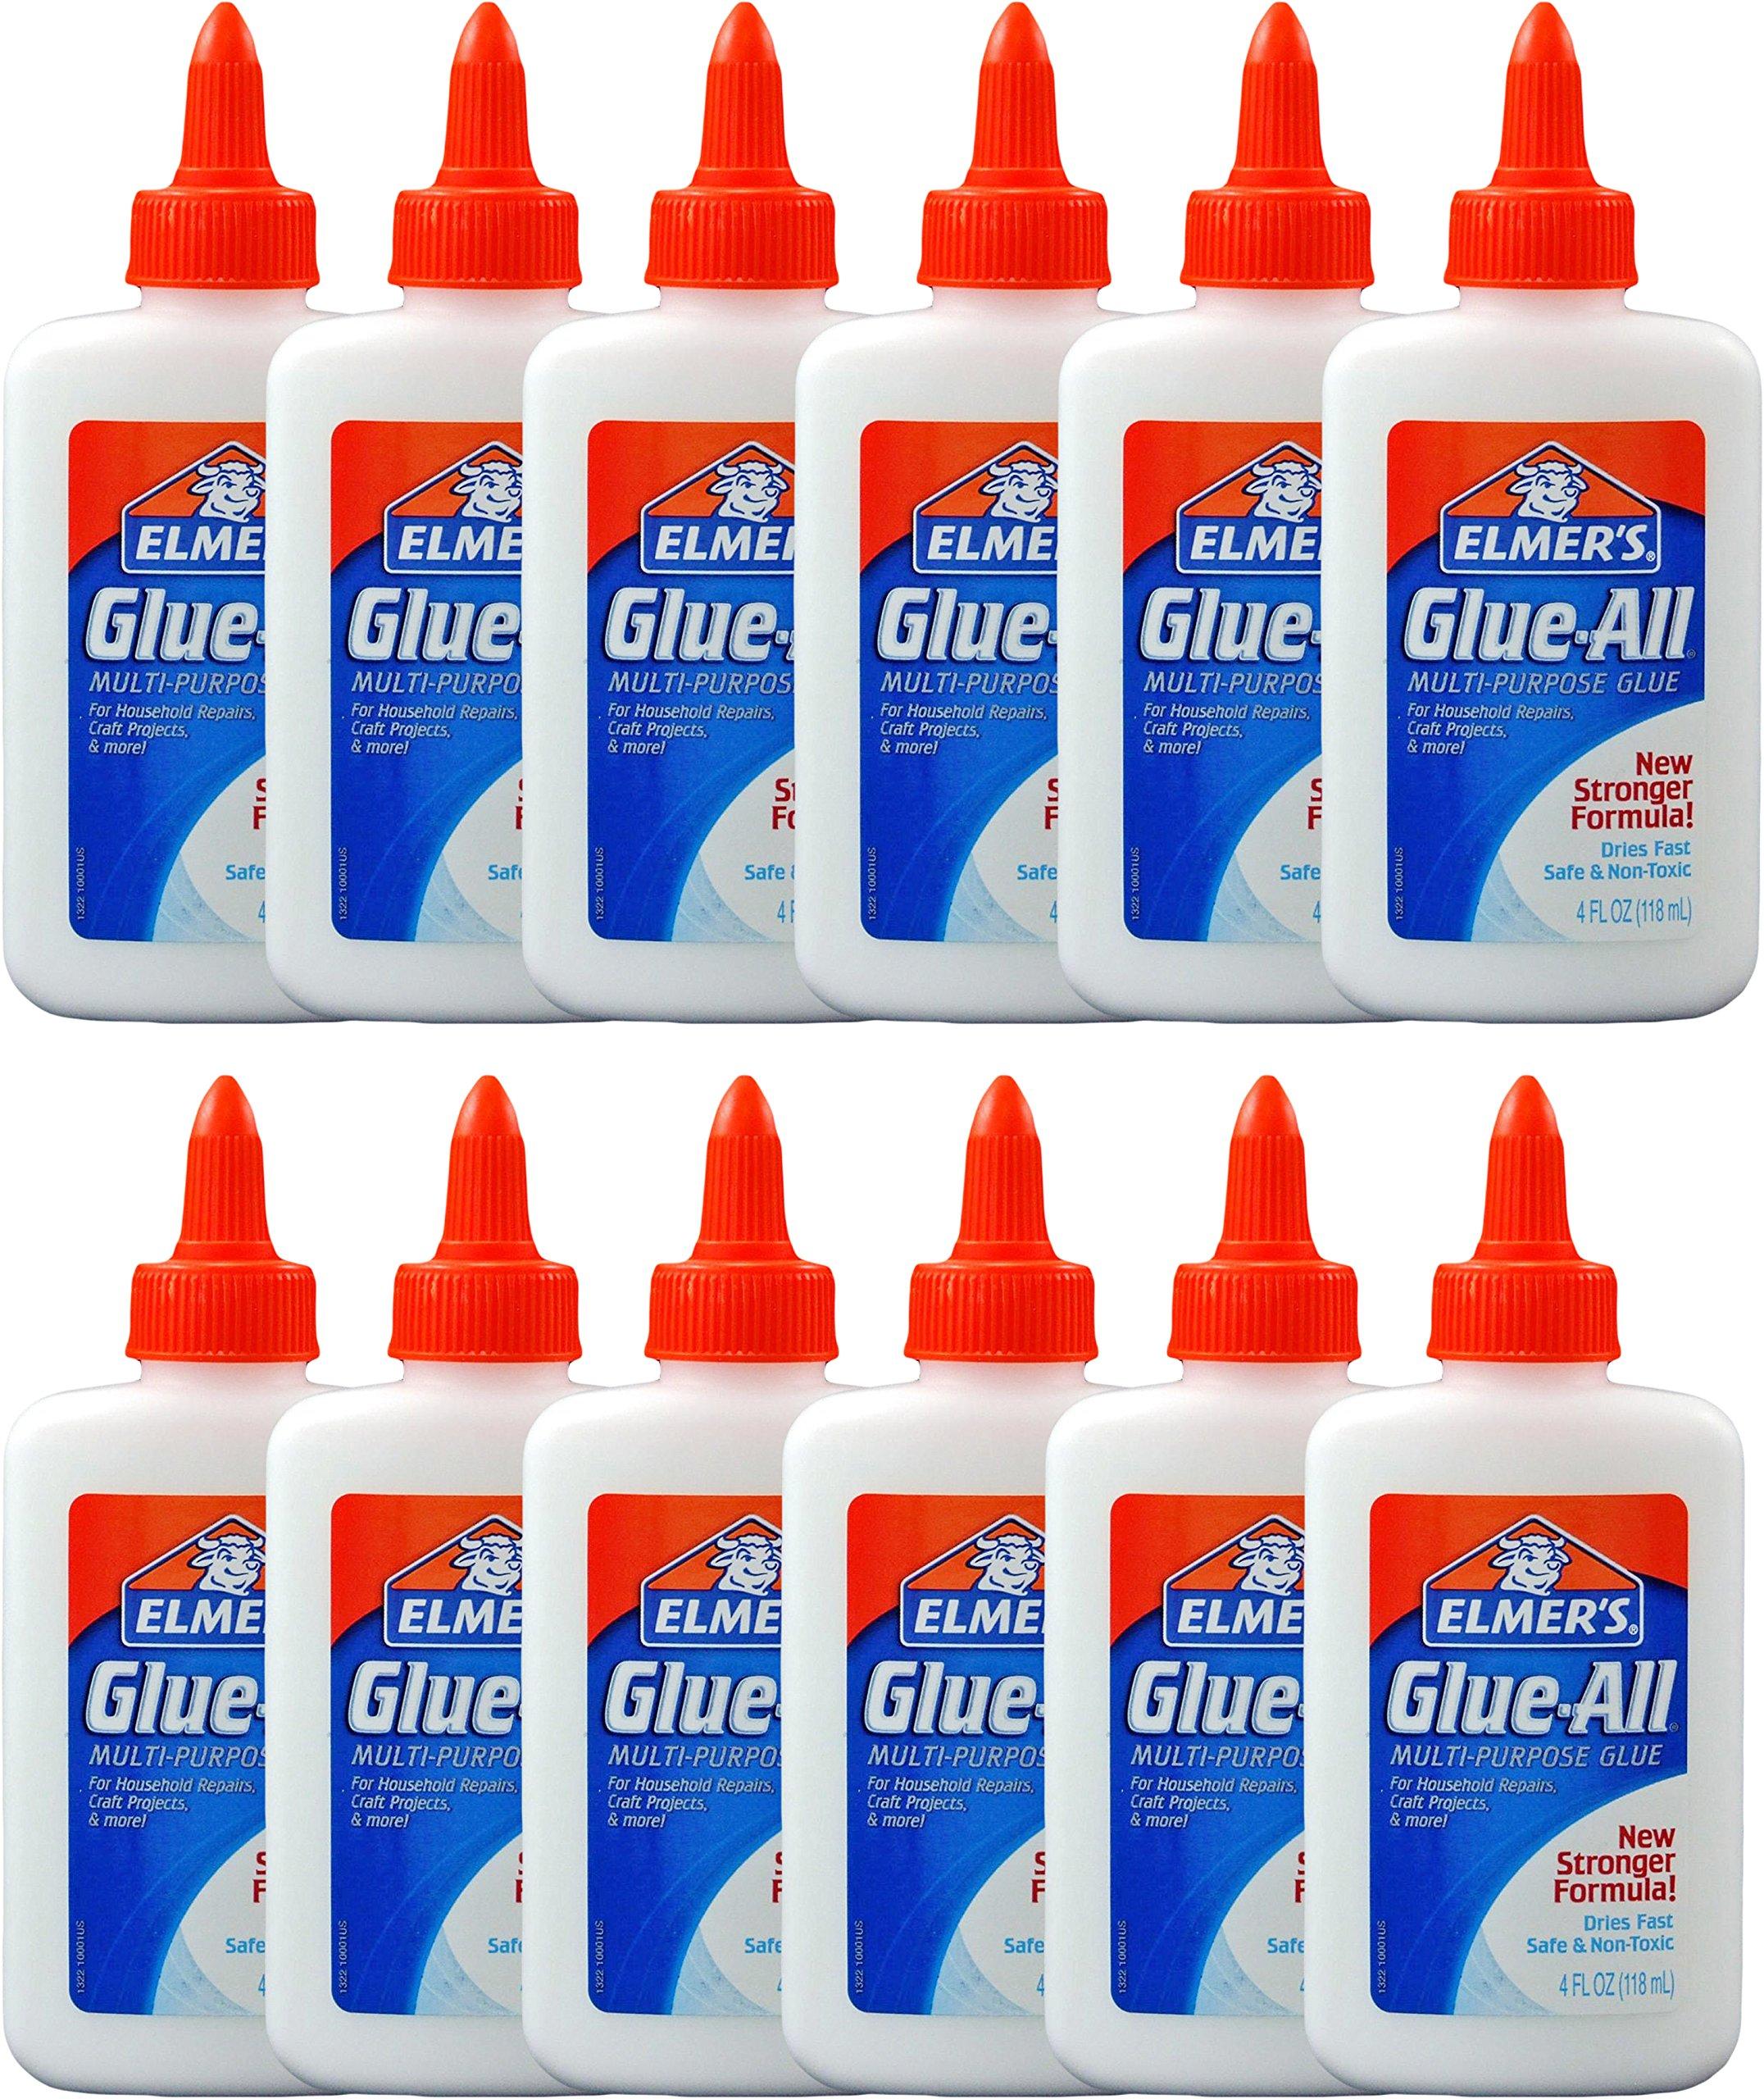 Elmer's Glue All Multi Purpose Glue, 4 Ounces (Pack of 12)